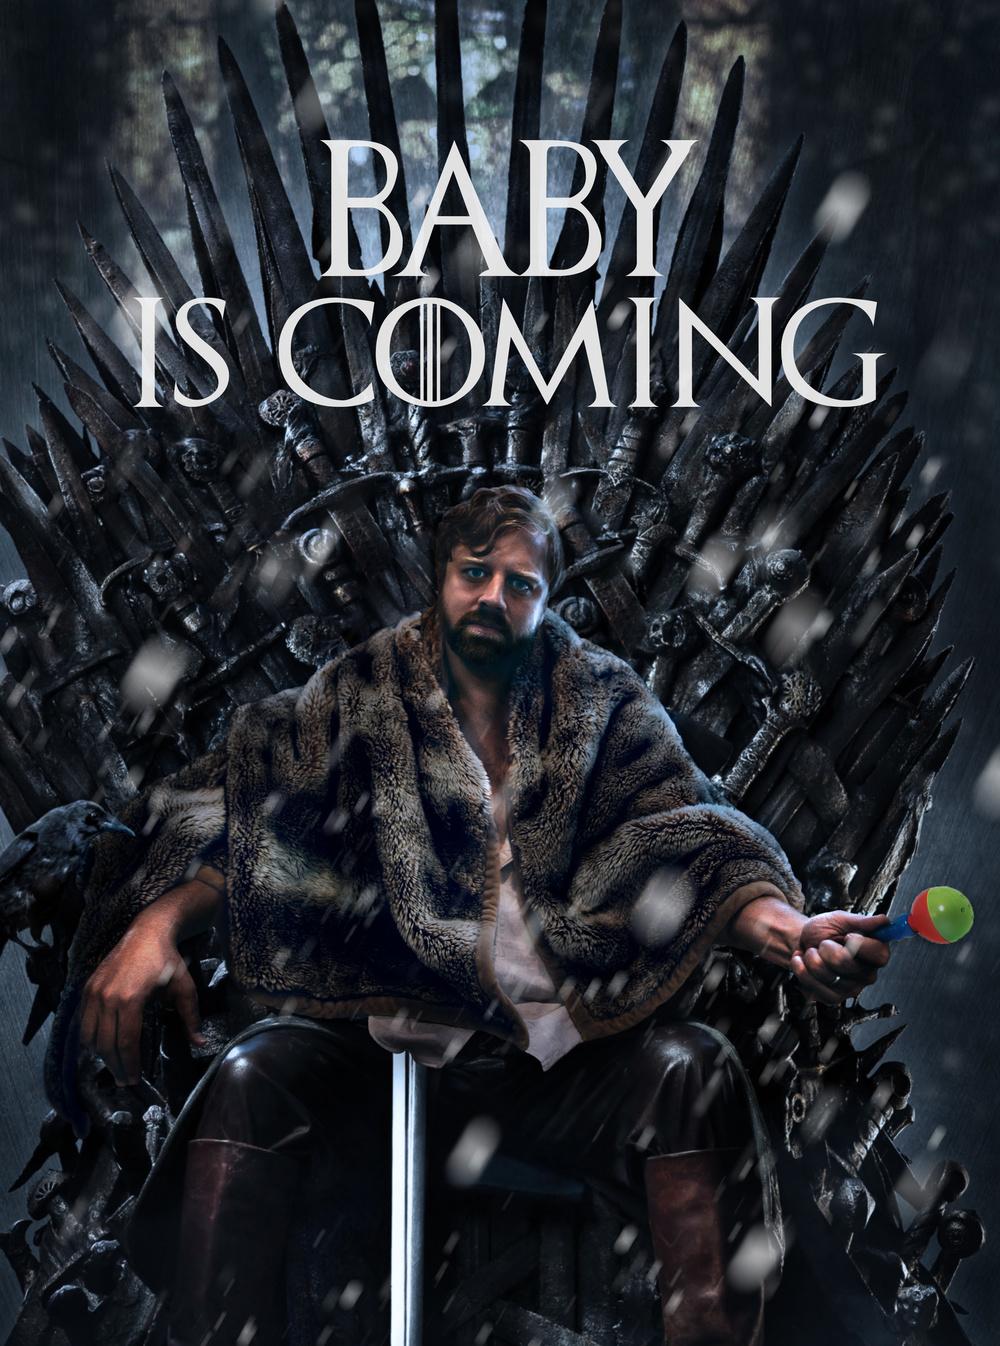 bishoto.com-babyiscoming_ep47rl.jpg